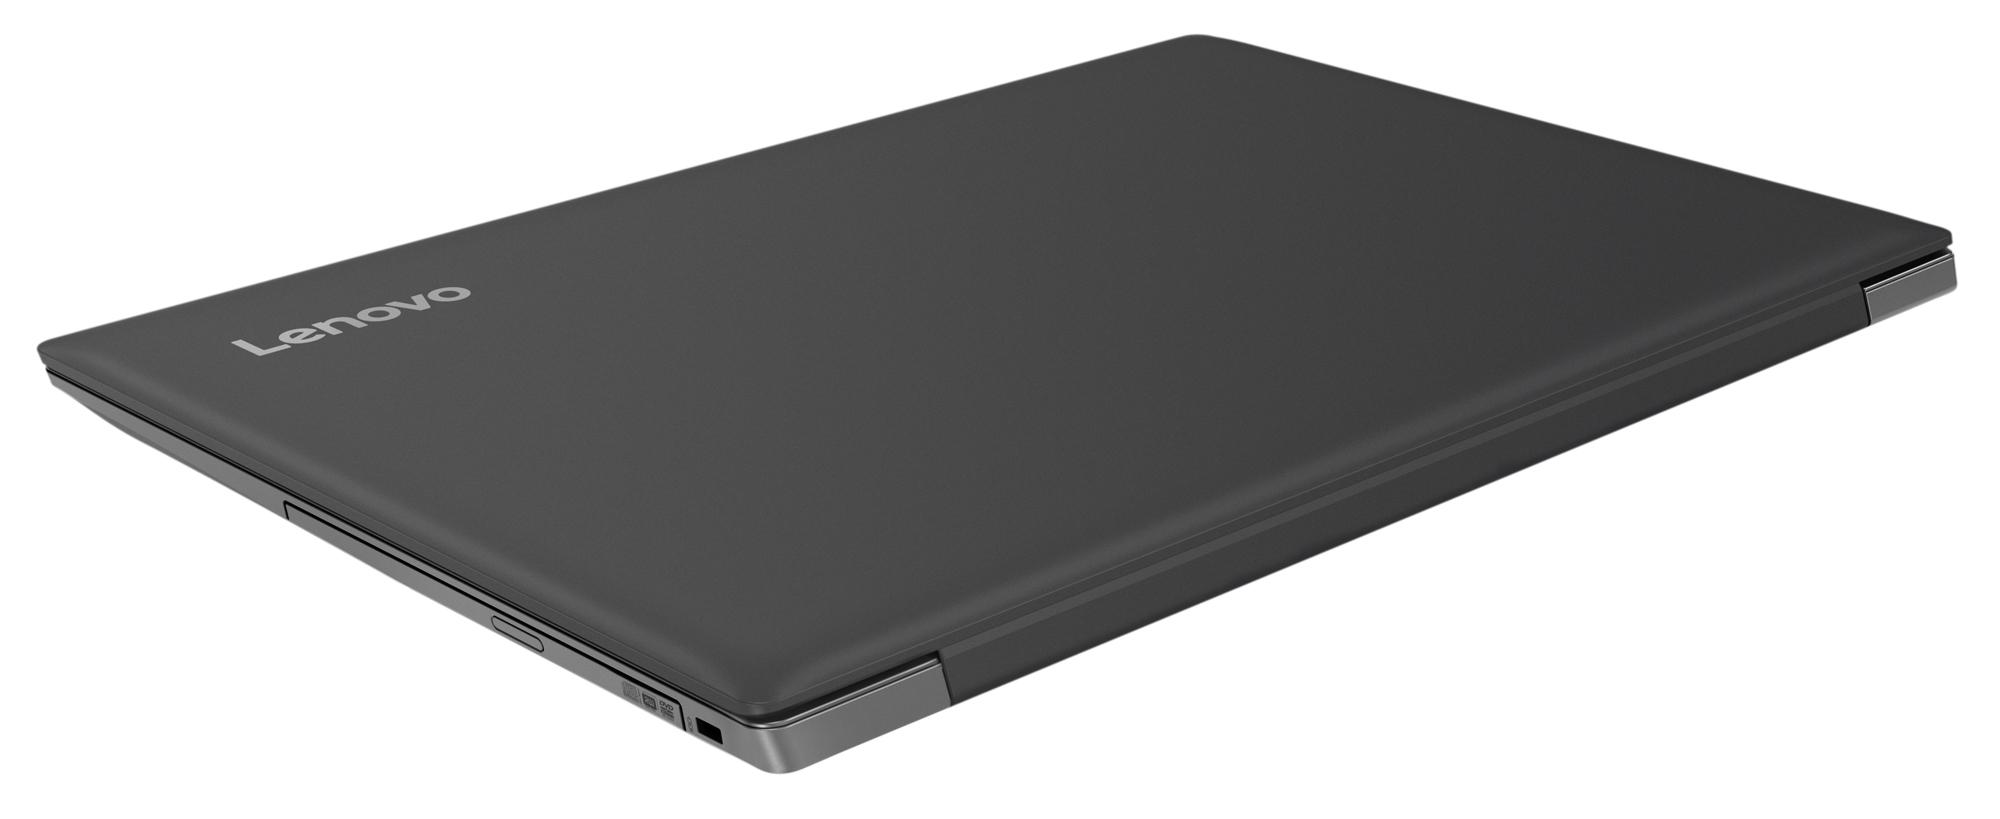 Фото  Ноутбук Lenovo ideapad 330-15 Onyx Black (81D100HSRA)